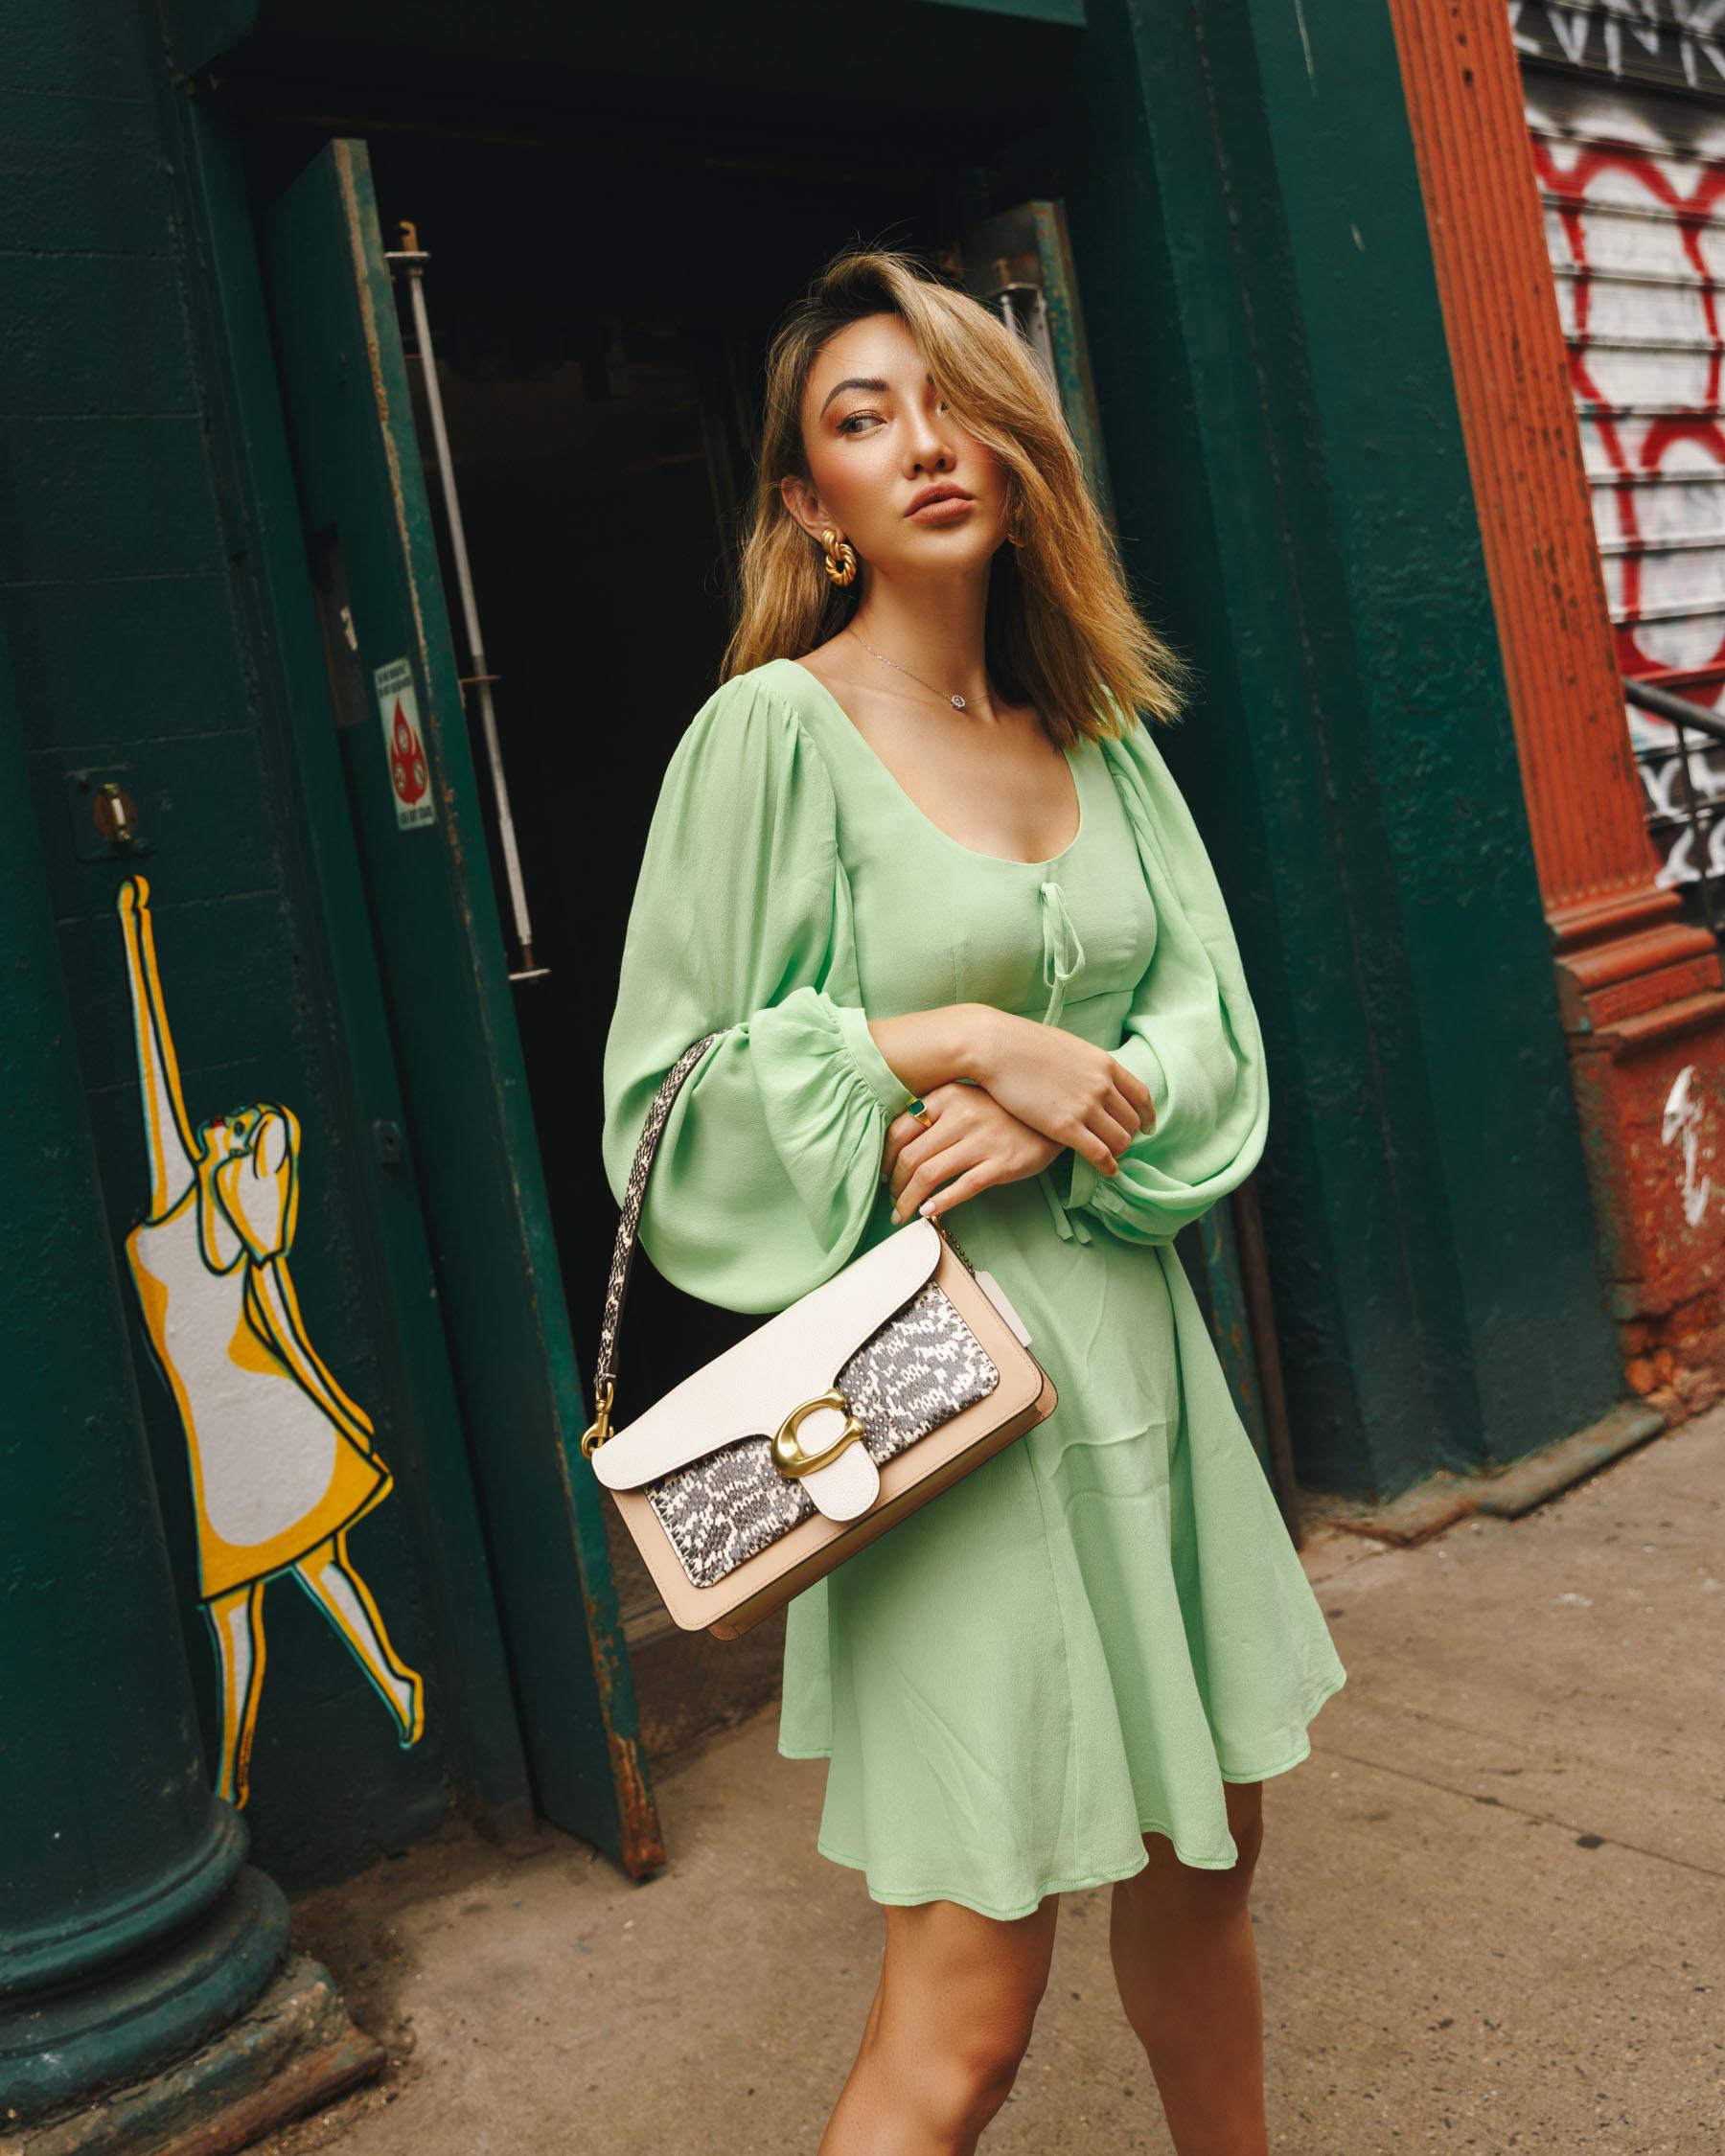 new fall beauty launches, pistachio green dress, fall beauty trends // Notjessfashion.com